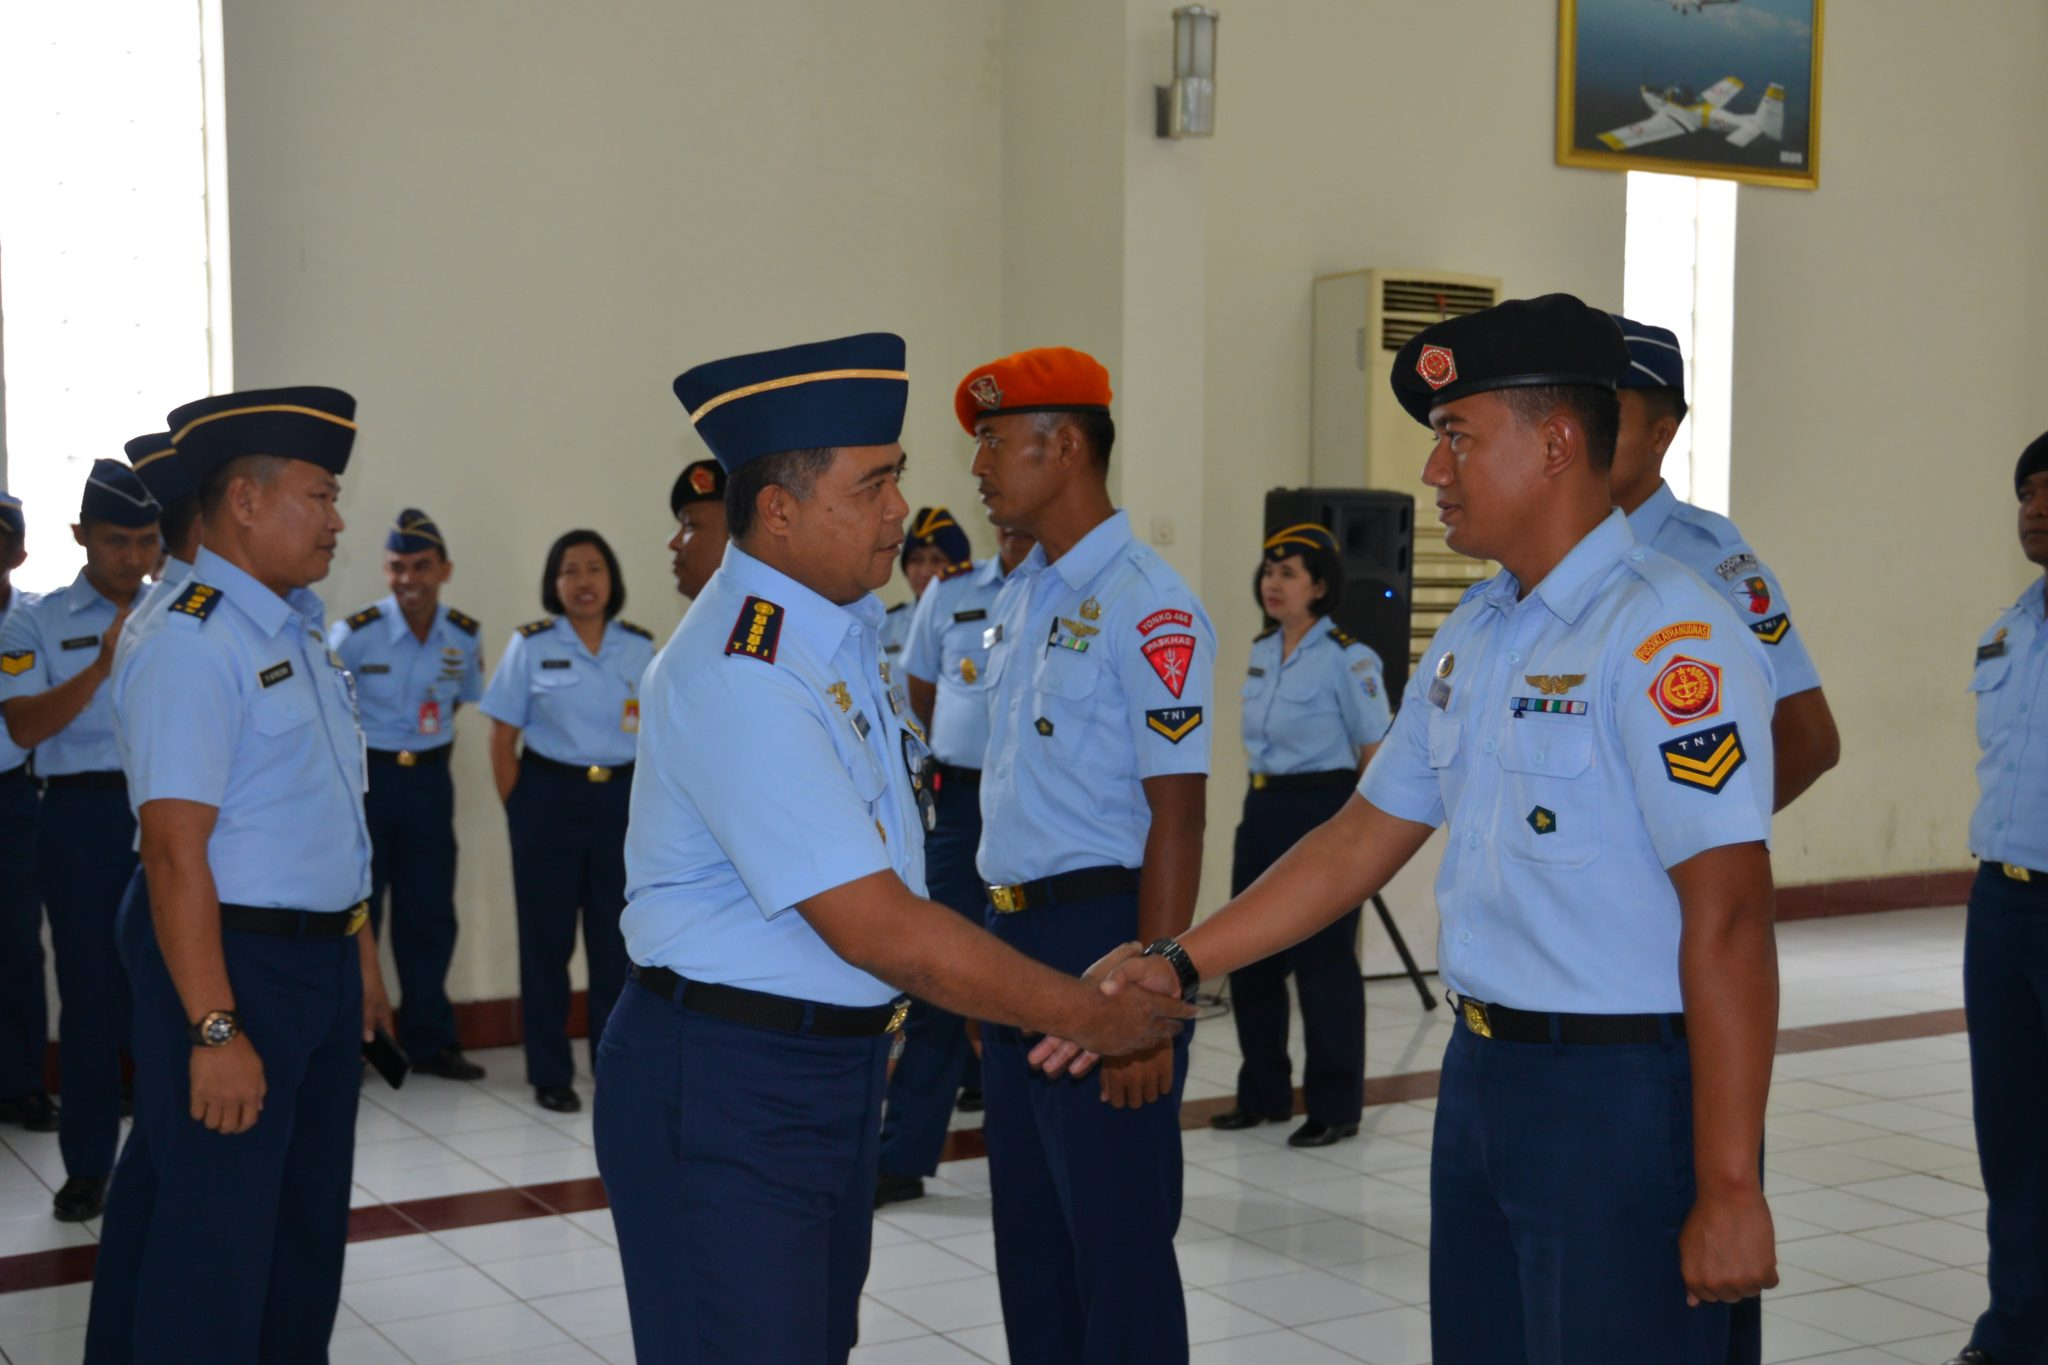 Pembukaan Susgumil Bintara A-27 Skadik 201 Lanud Sulaiman